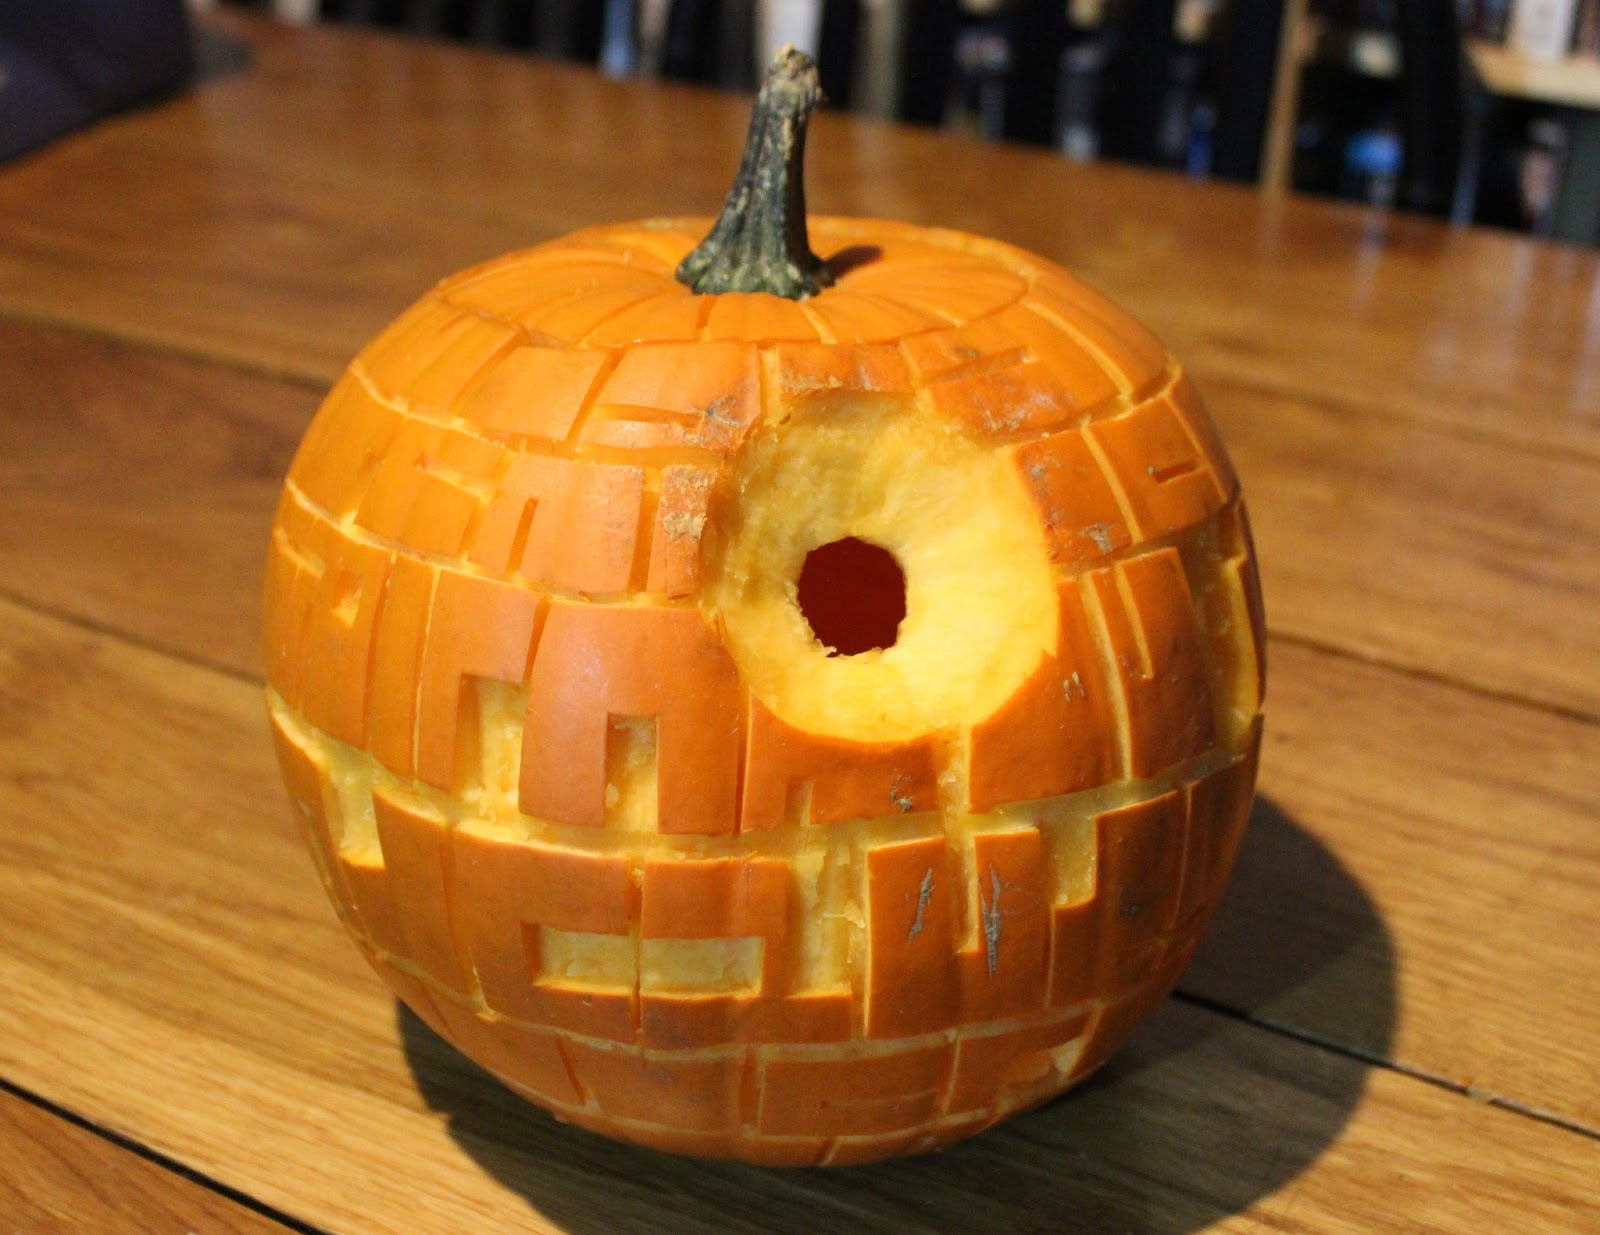 Random nerdery halloween the obligatory pumpkin themed post